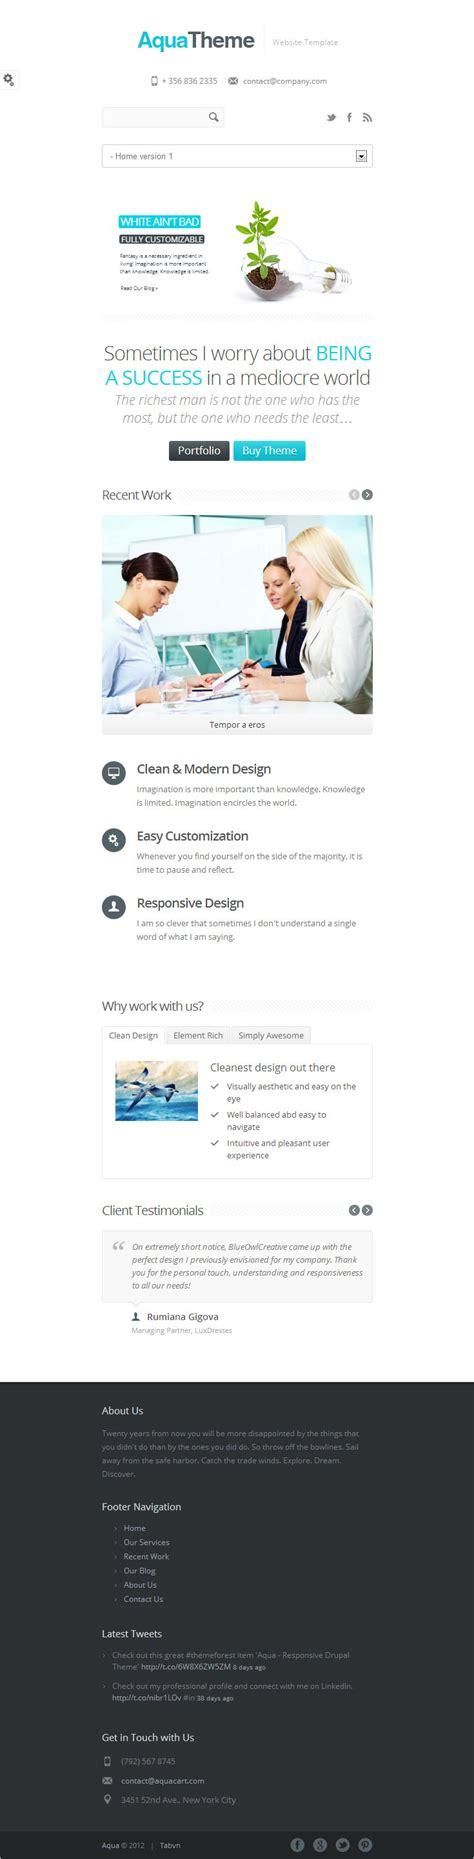 drupal theme alter aqua premium responsive drupal theme for corporate web